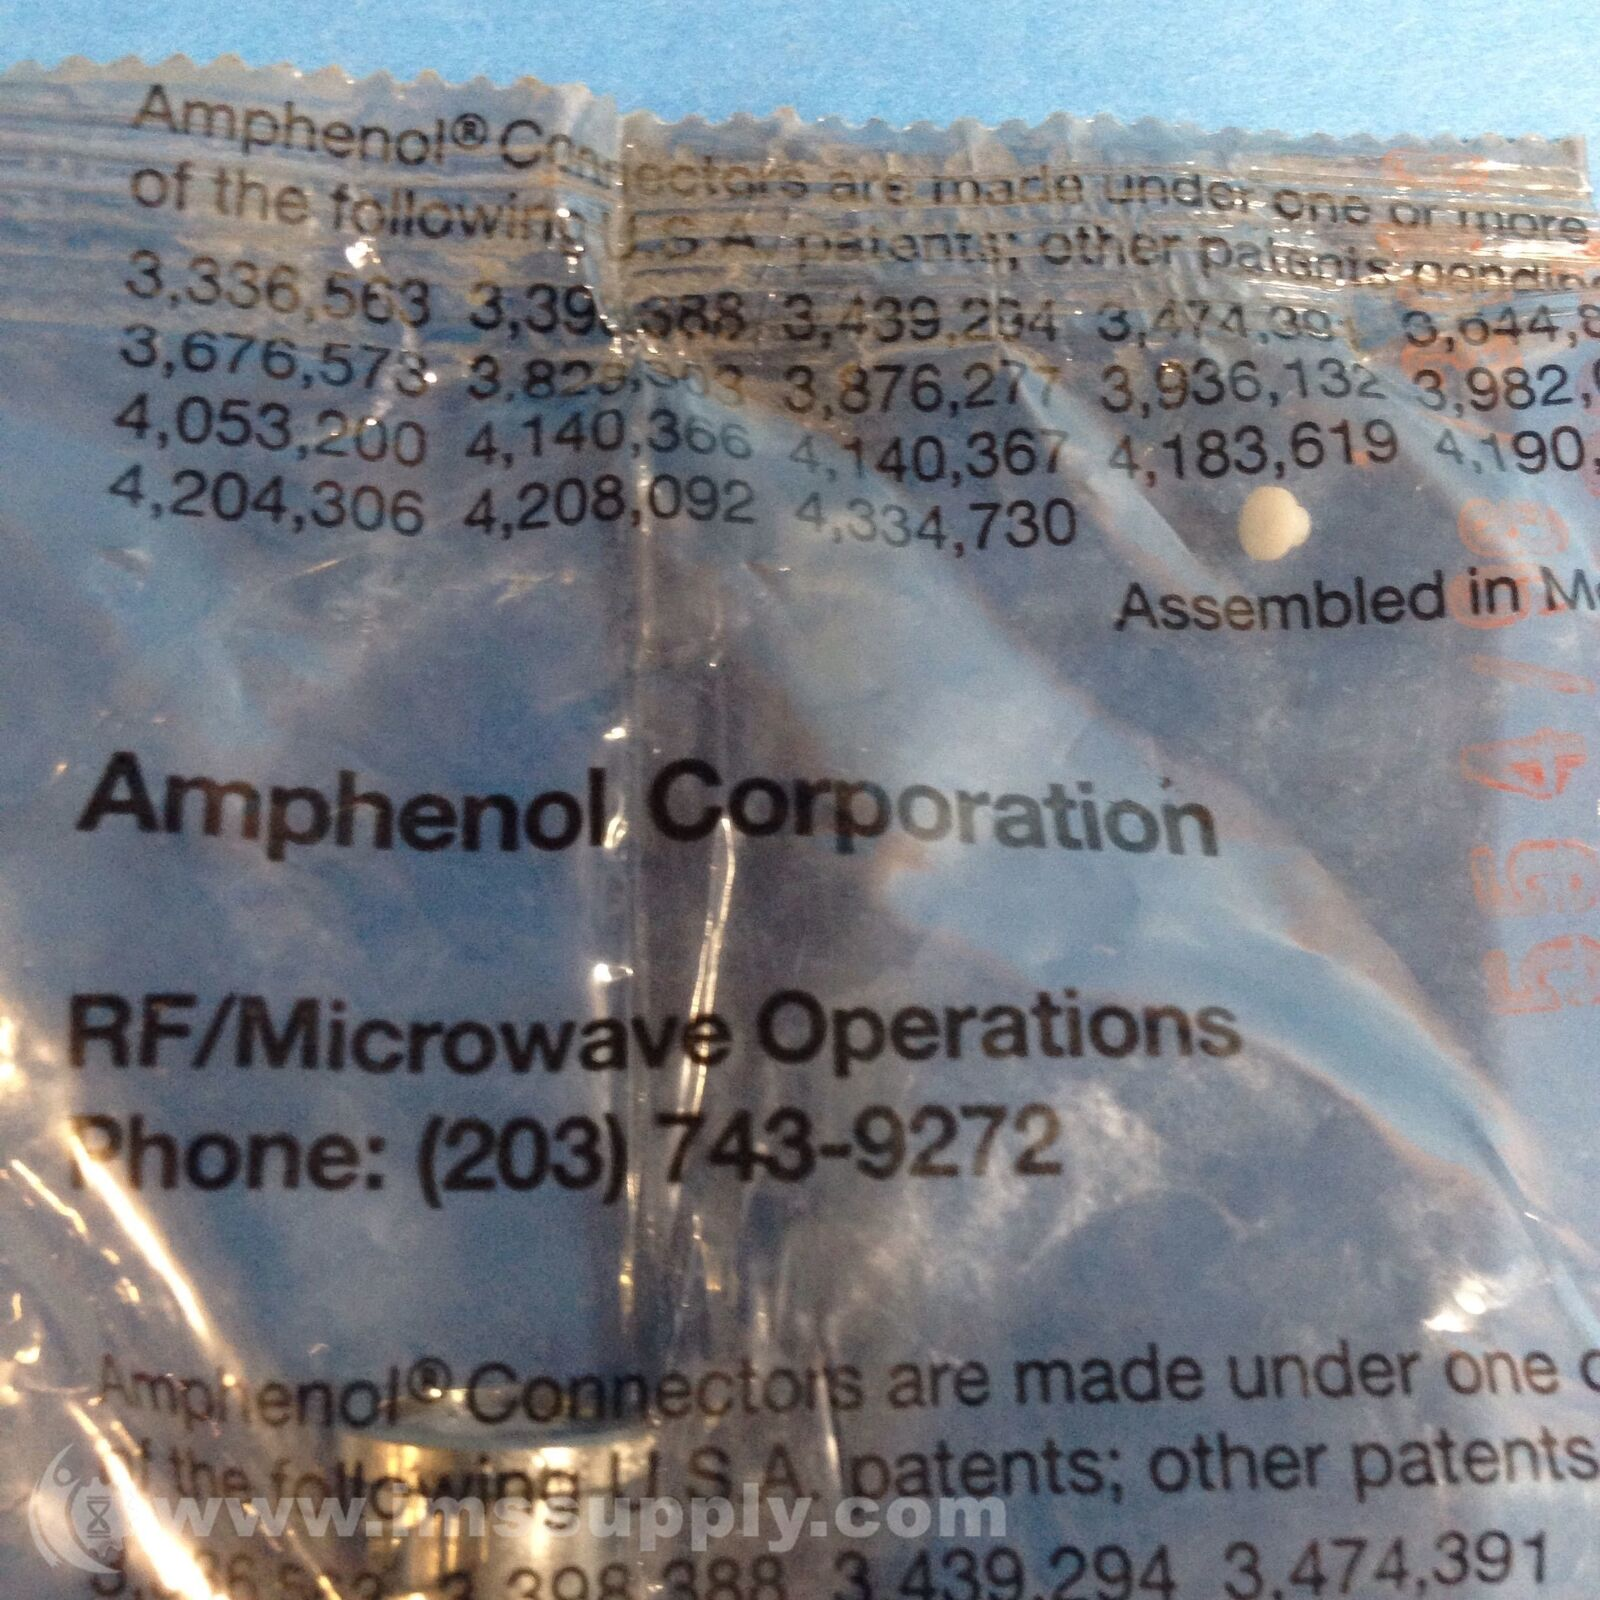 Amphenol HP Agilent 74868 Ug-30 N Female Adapter for sale online